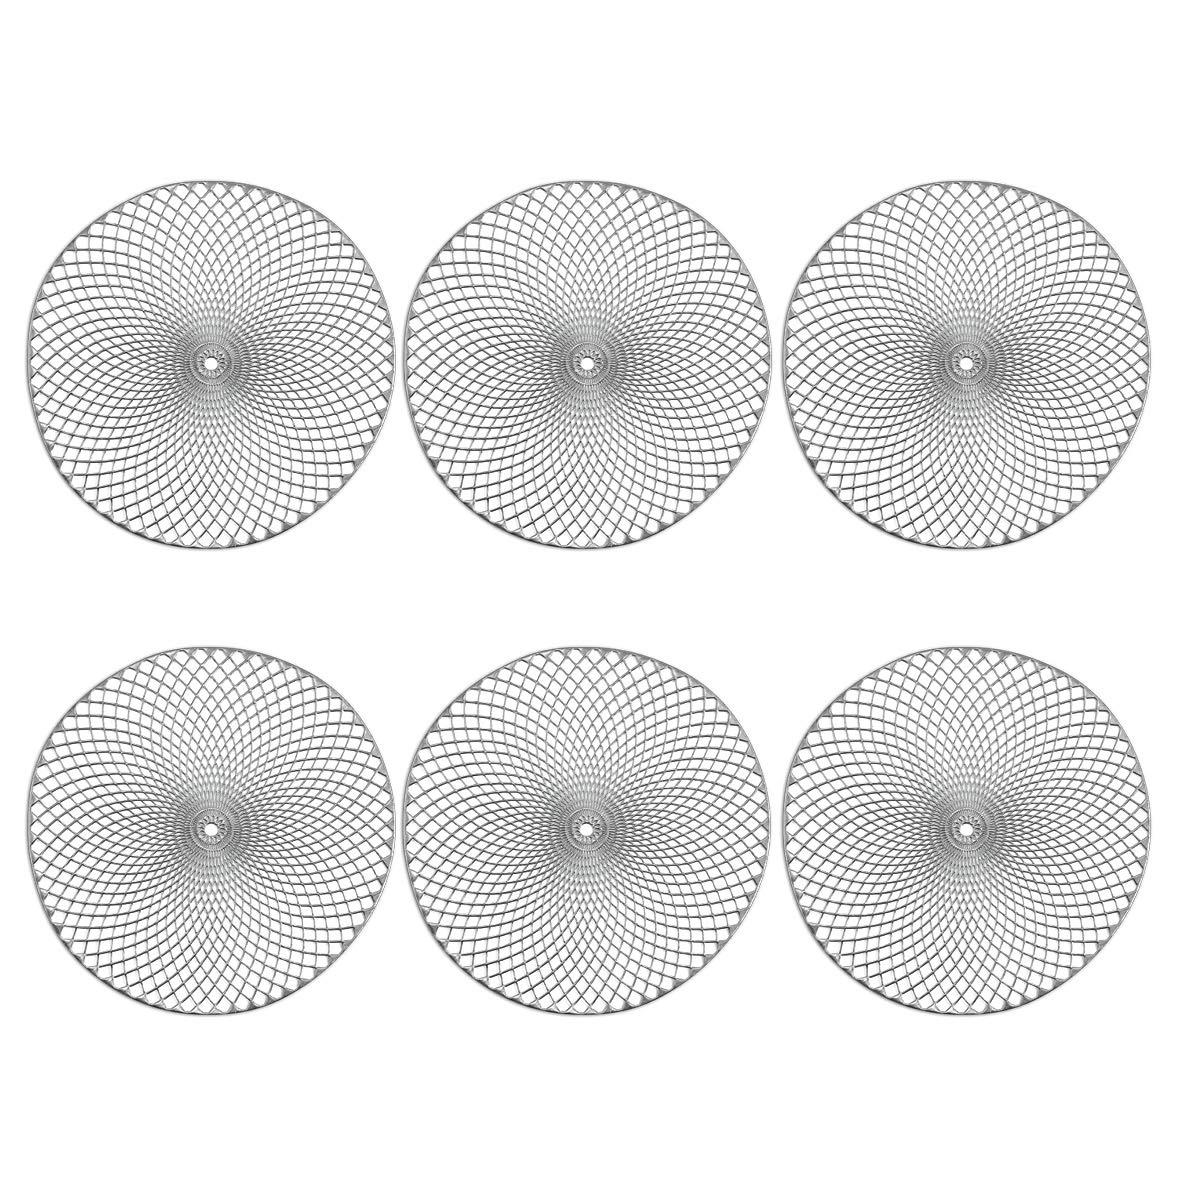 Zeller Lot de 6 Sets de Table Mandala en PVC Argent/é